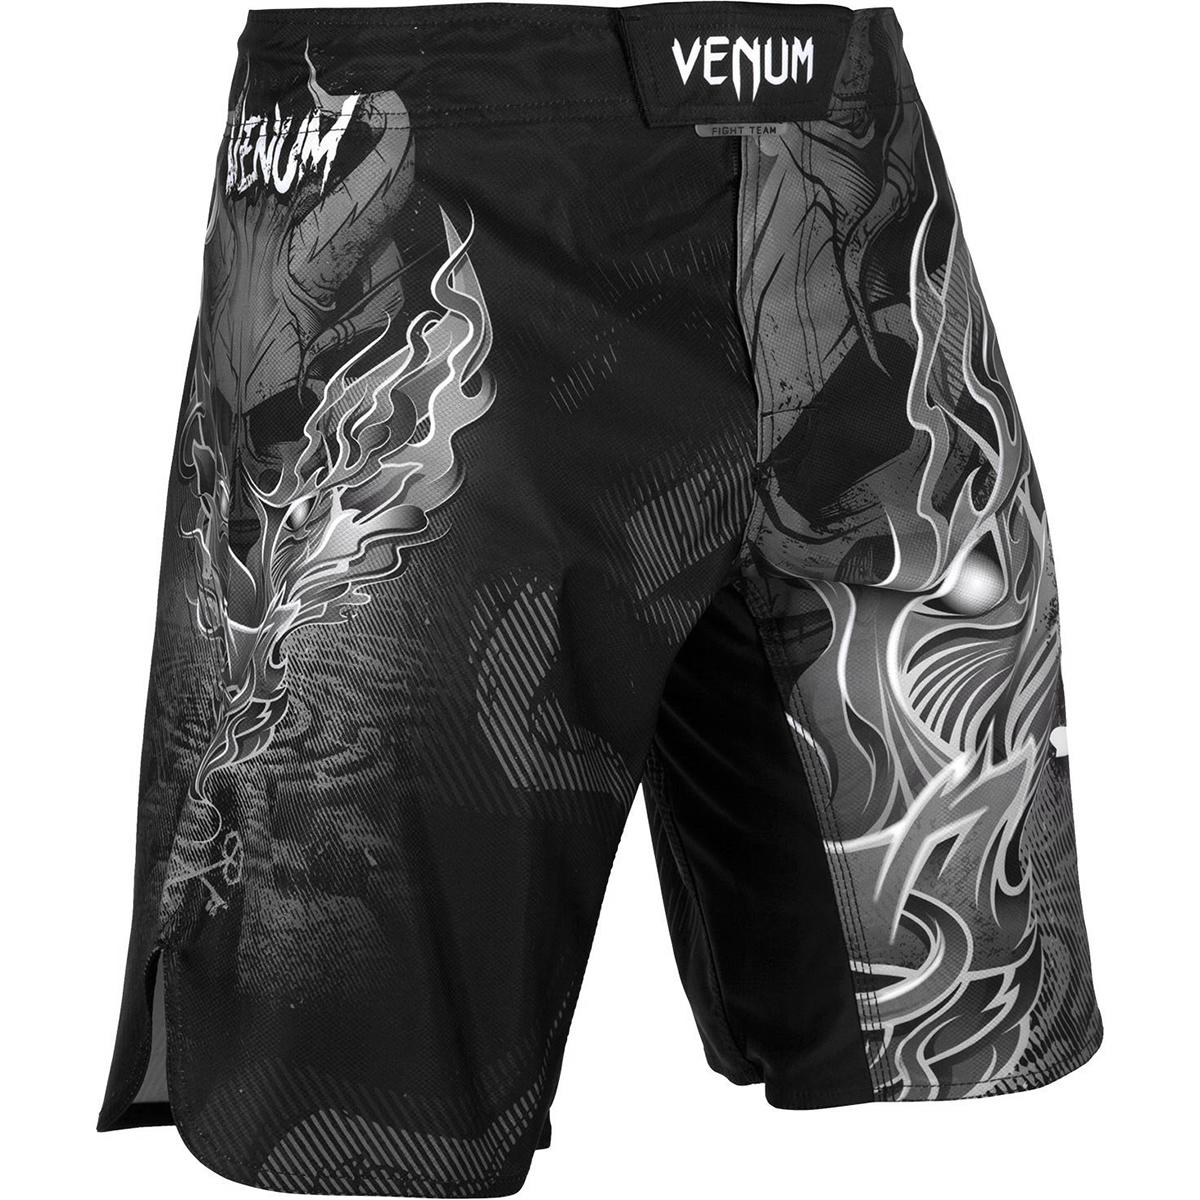 Shorts Black/white Discounts Price Venum Light 3.0 Mma Fight Shorts